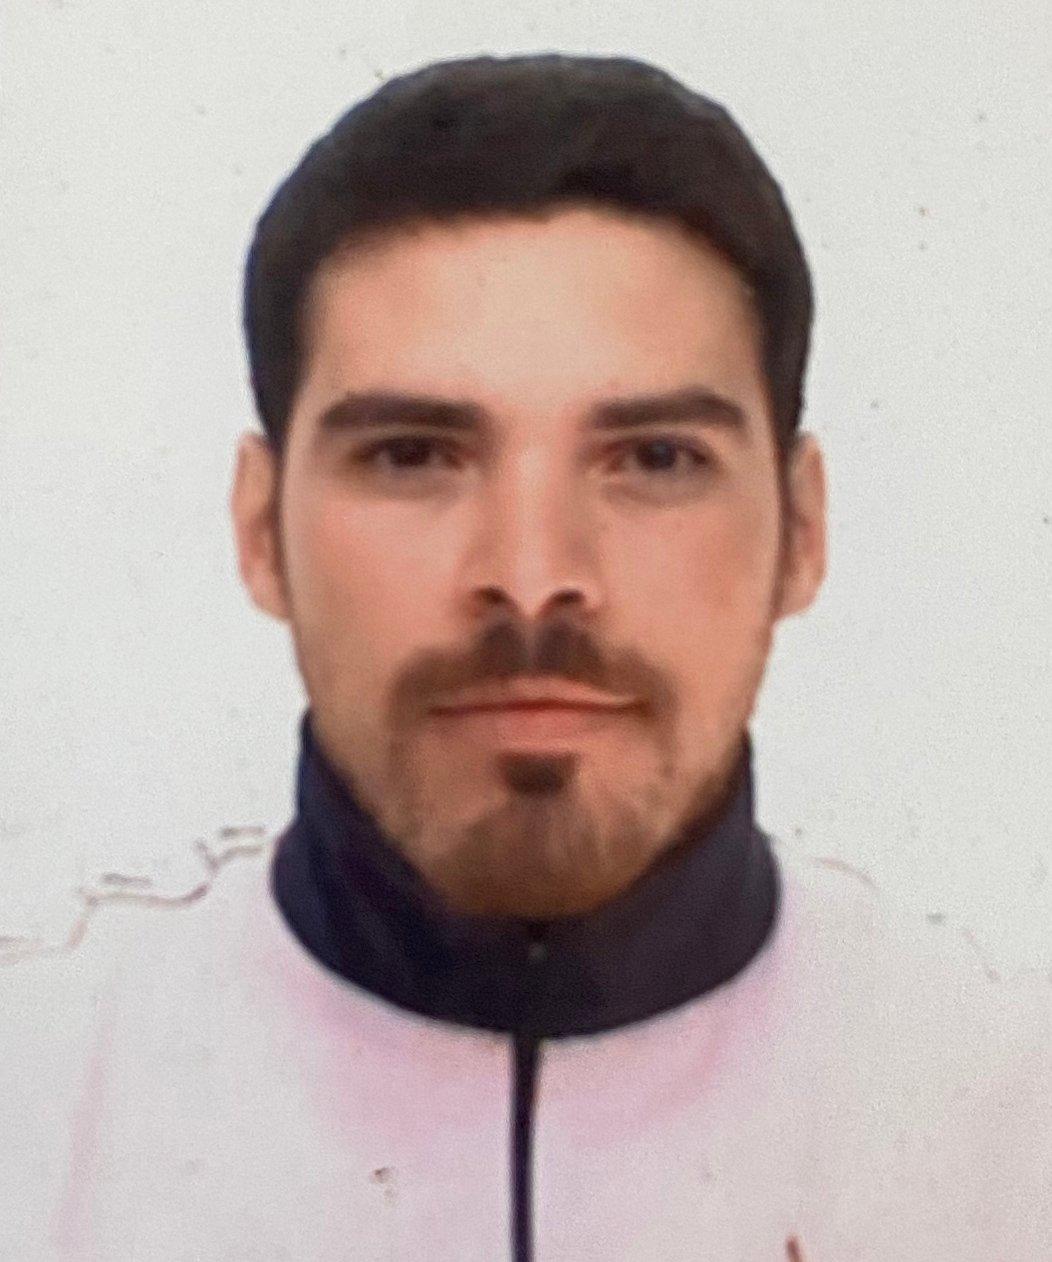 Mr. Carlos Calvo